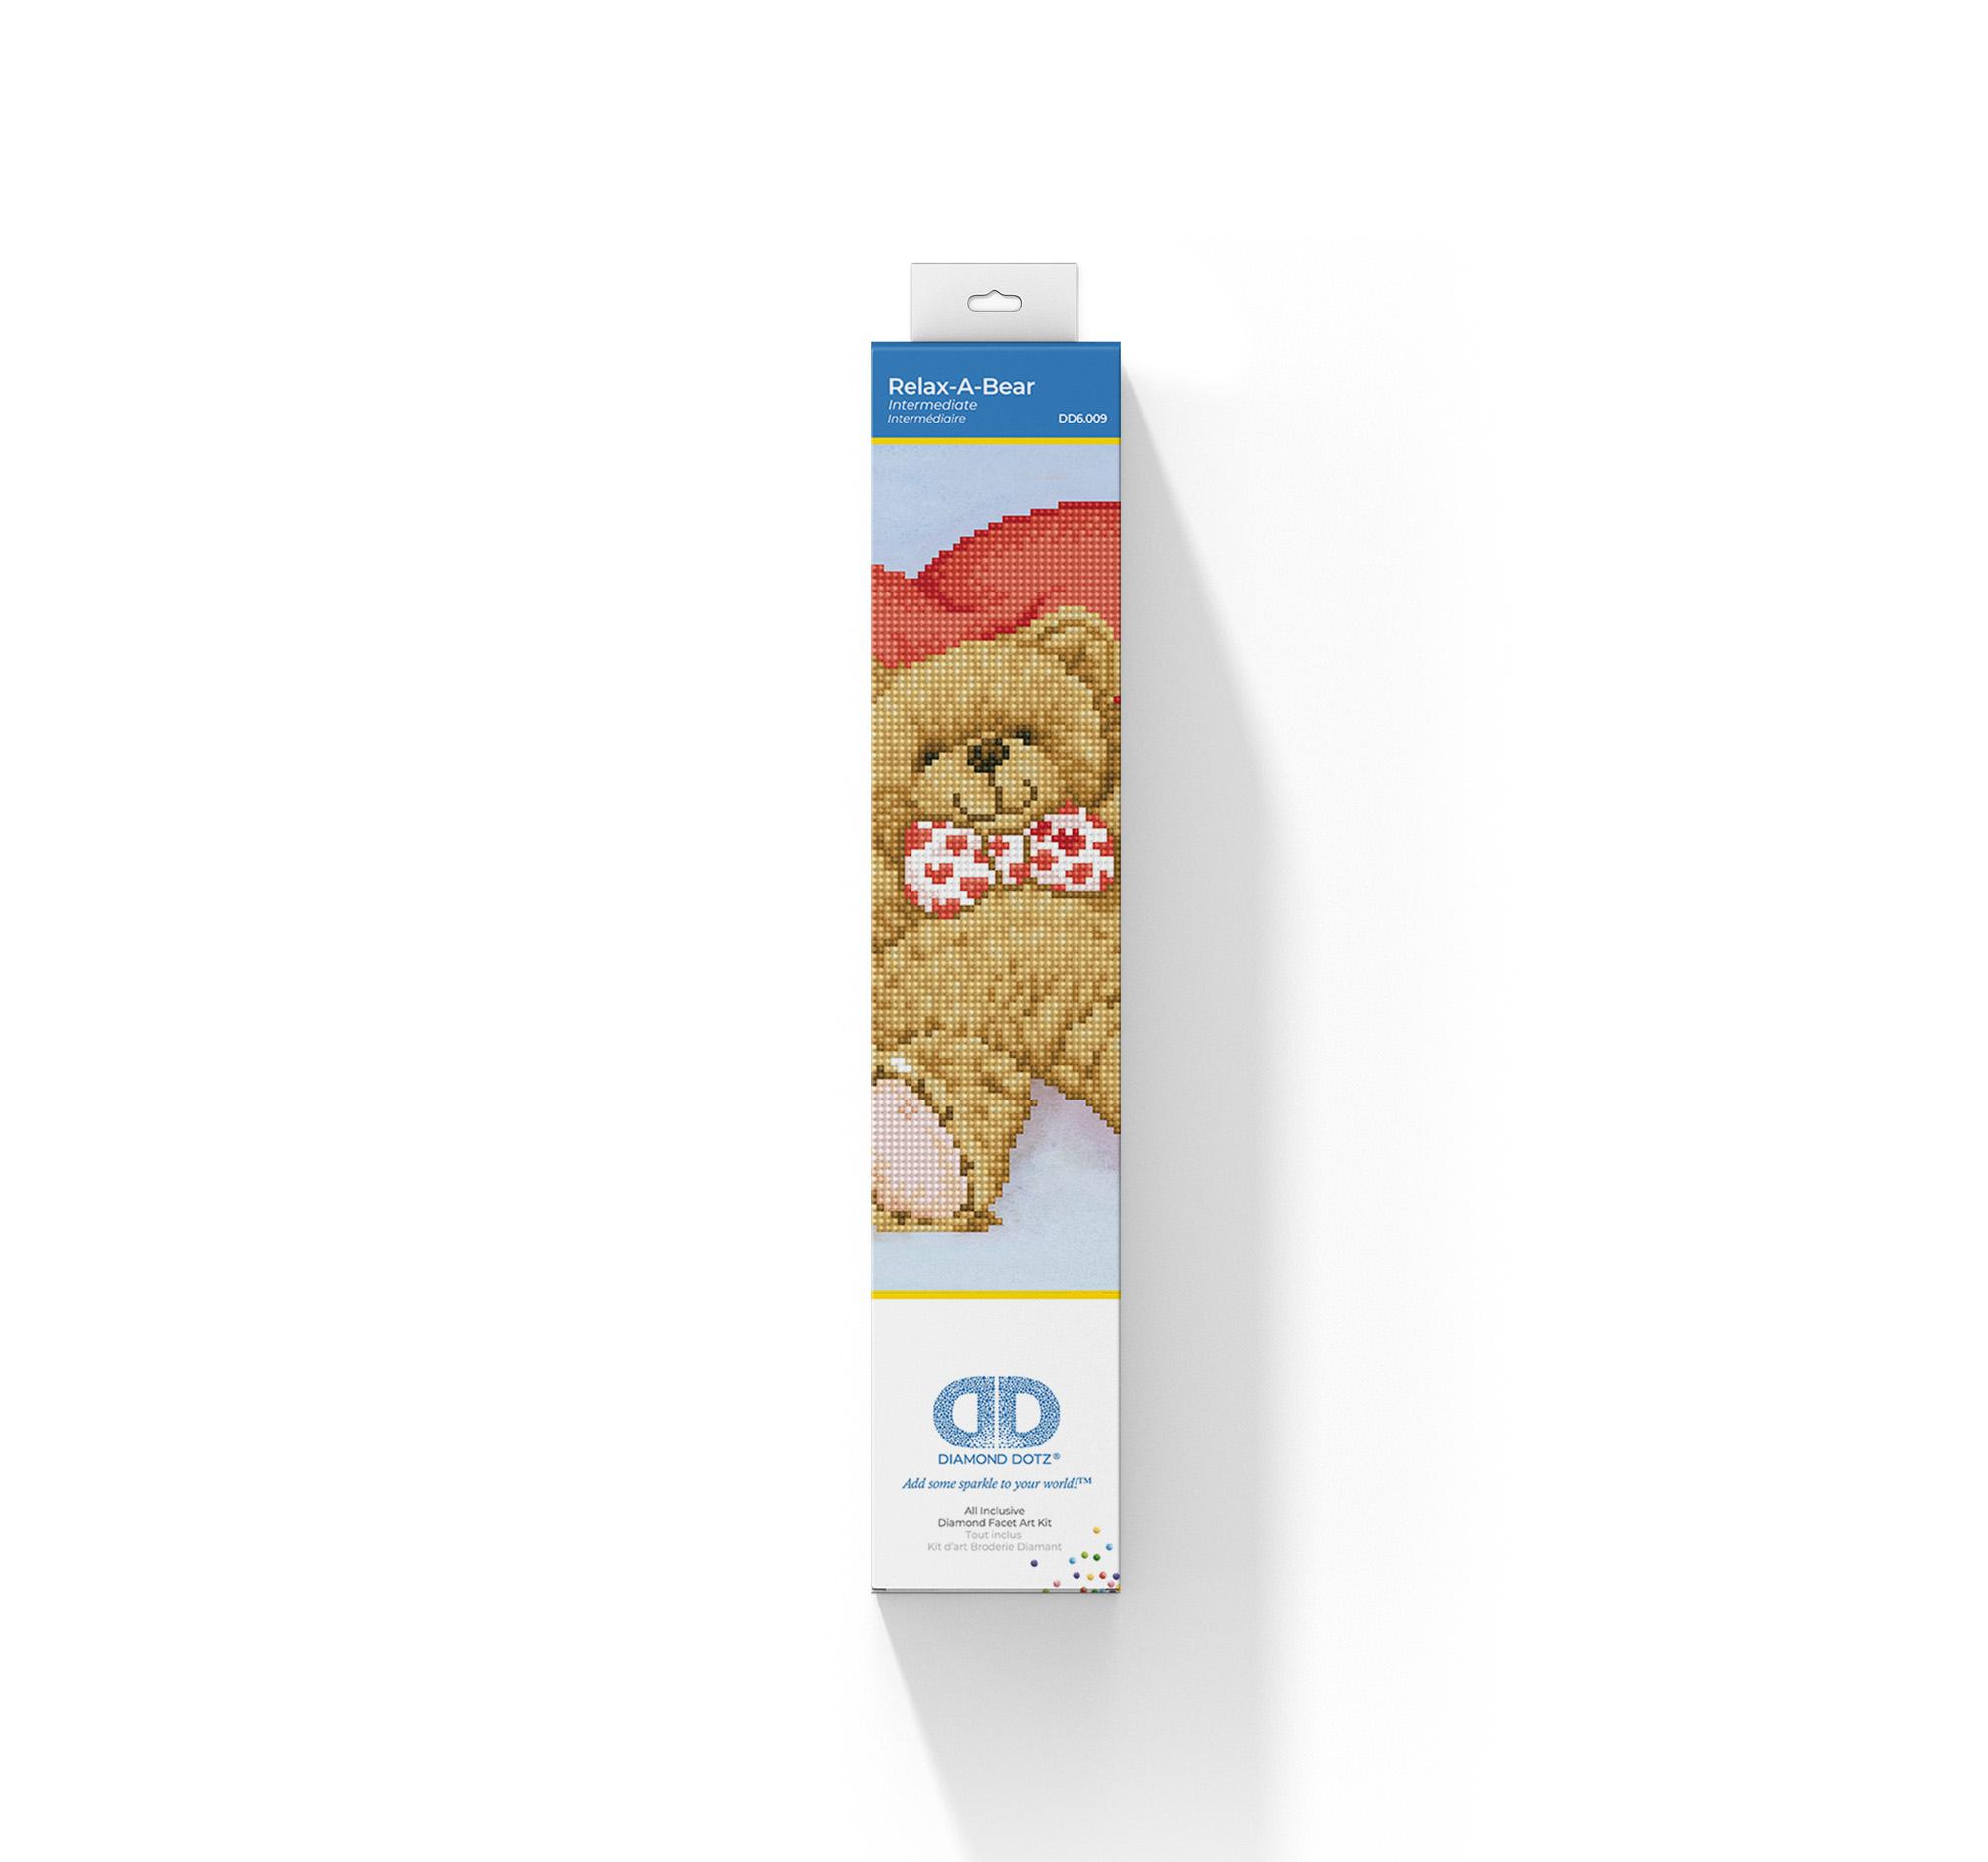 DD6.009_packaging